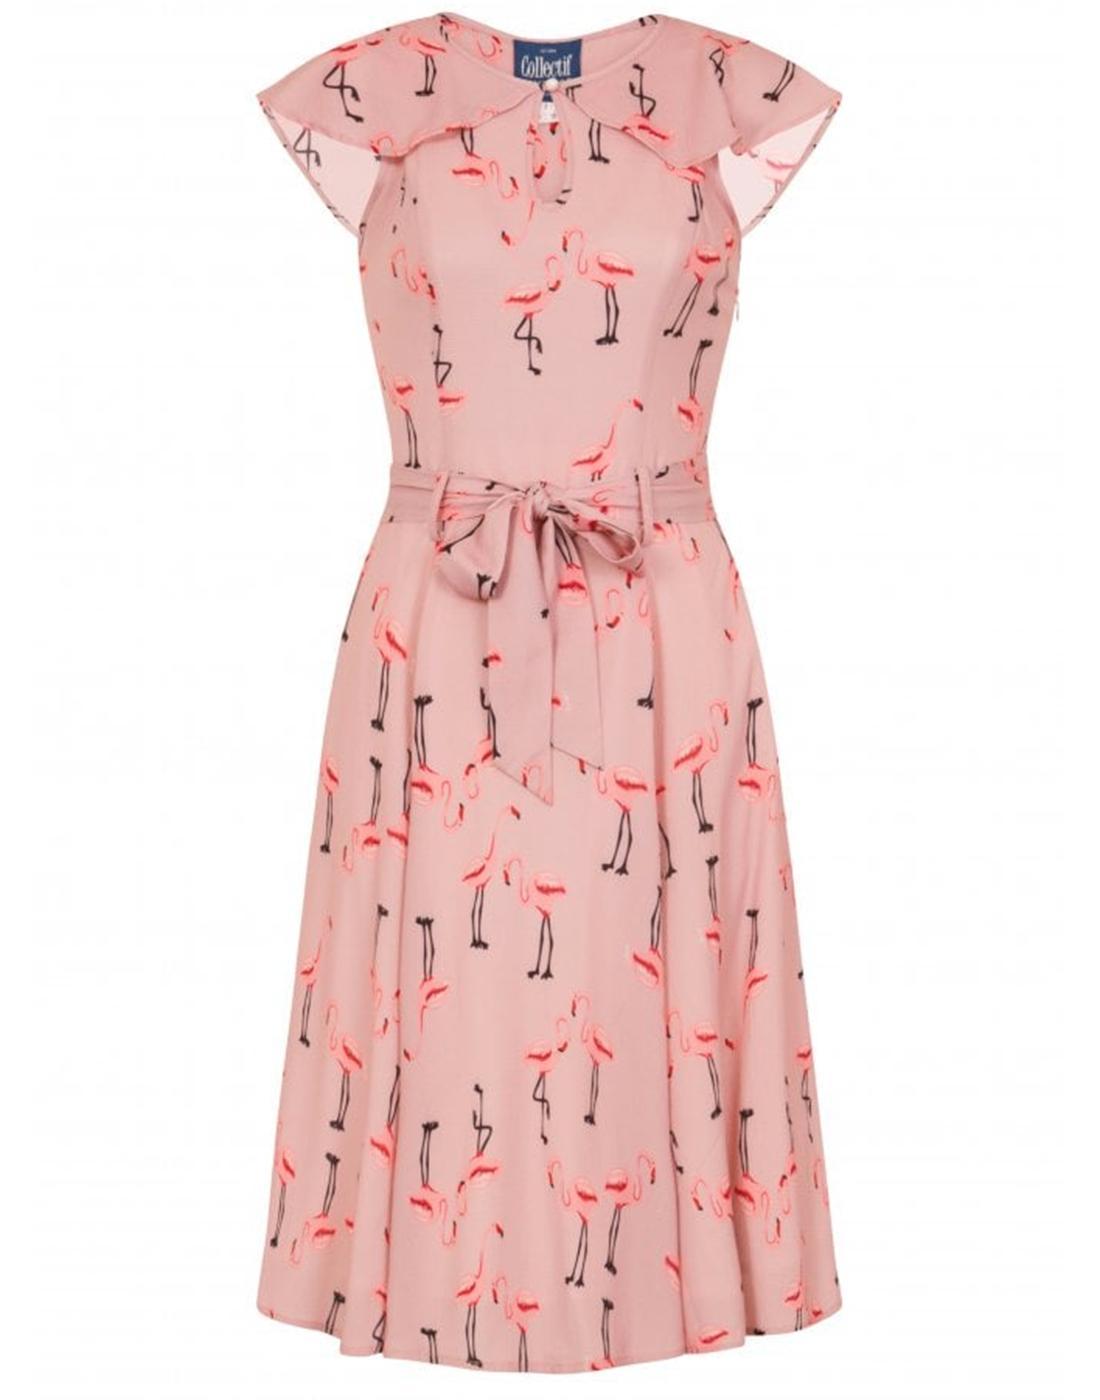 Tamara COLLECTIF Retro Vintage 50s Flamingo Dress